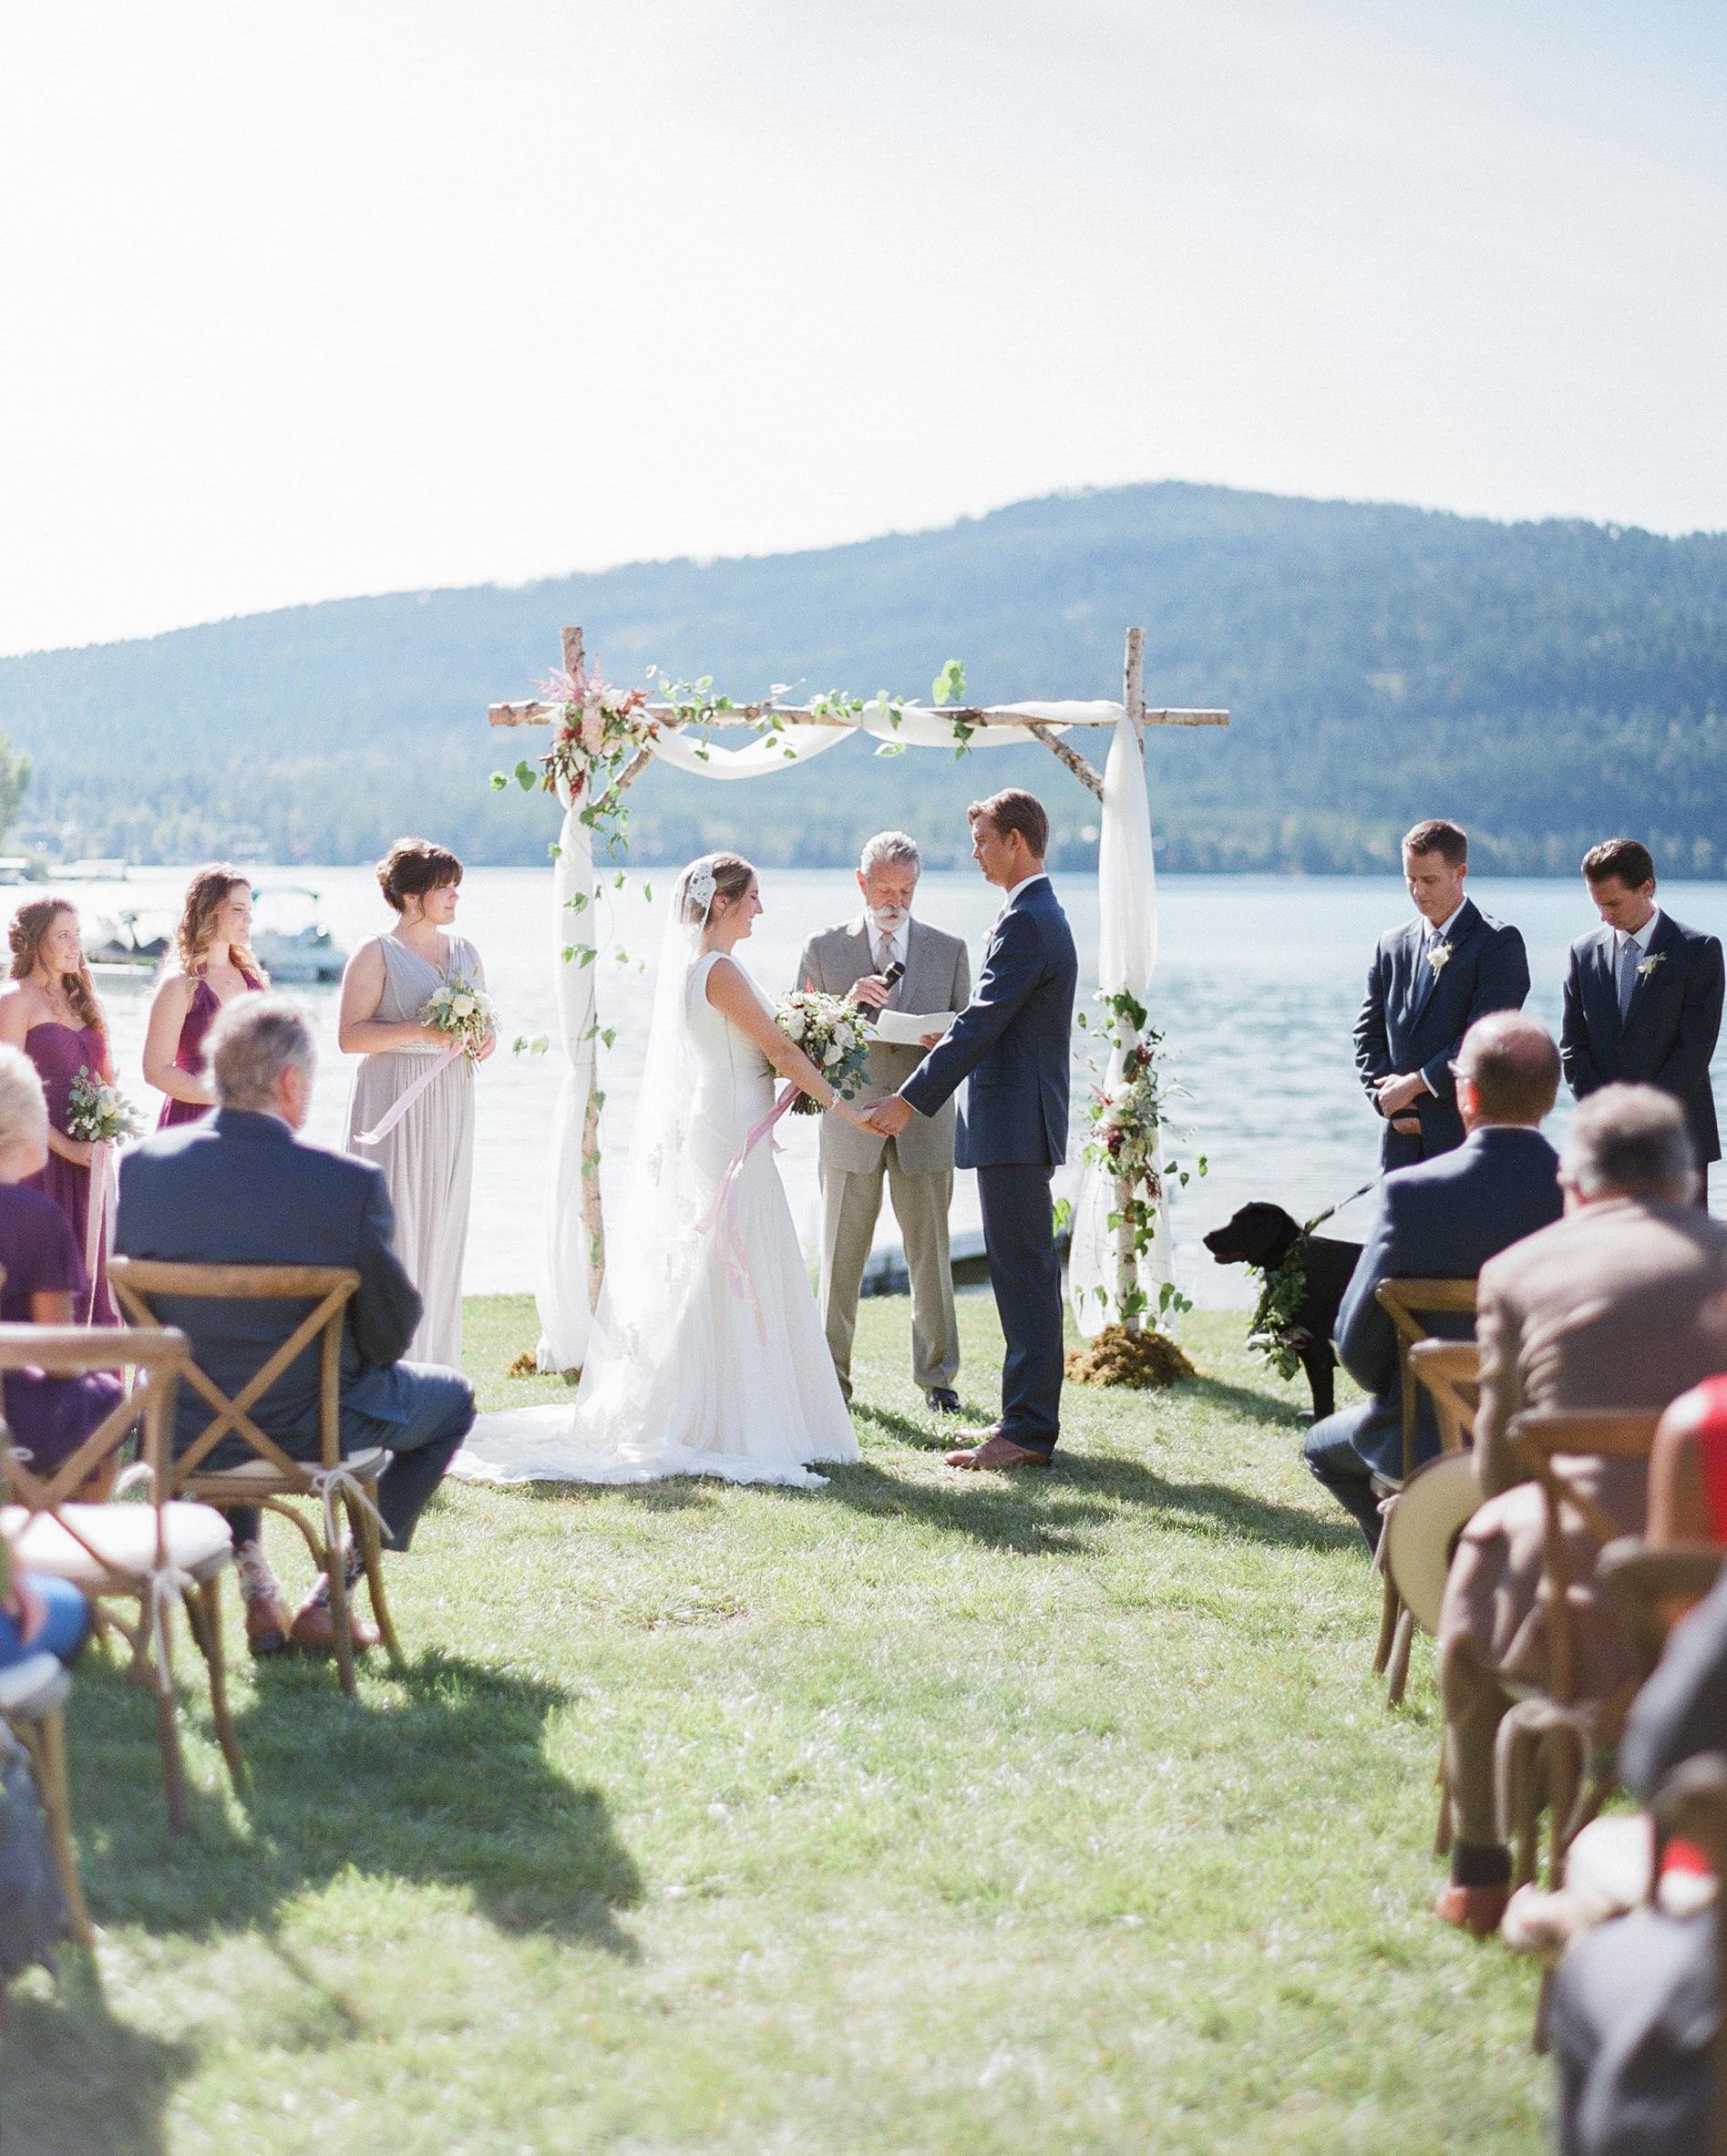 robin-kenny-wedding-ceremony-056-s112068-0715.jpg